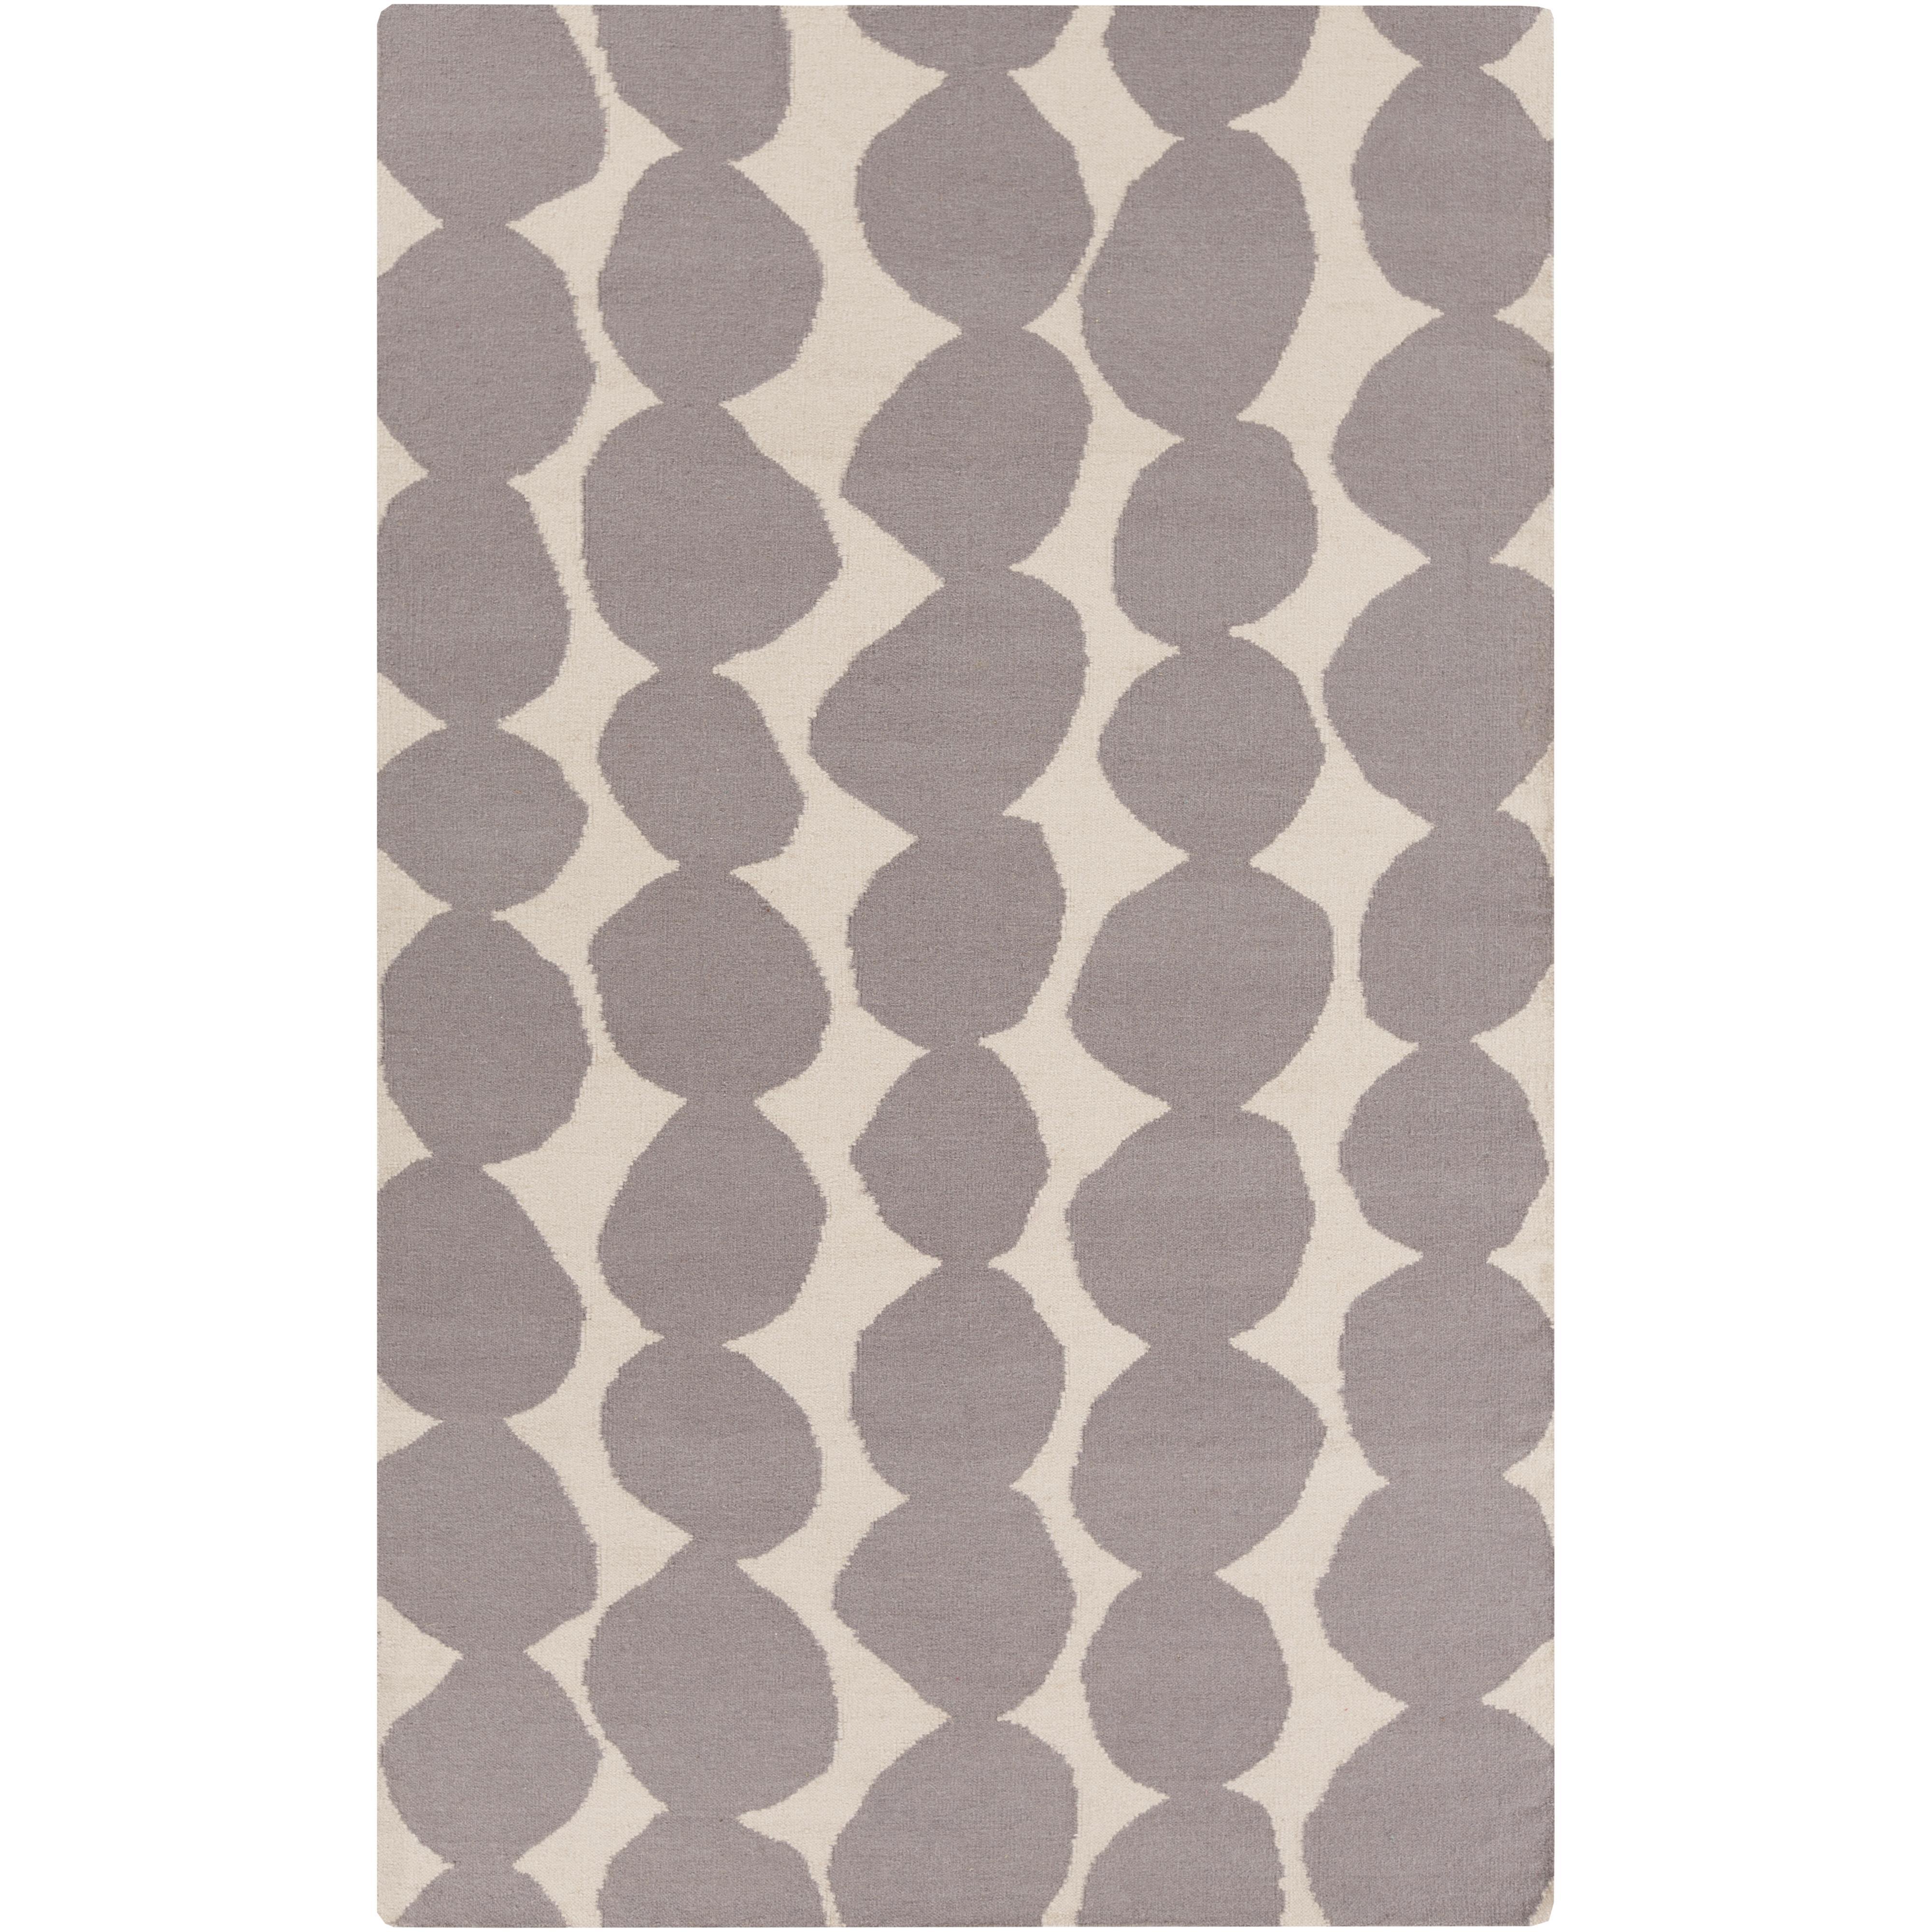 Surya Rugs Textila 2' x 3' - Item Number: TXT3009-23